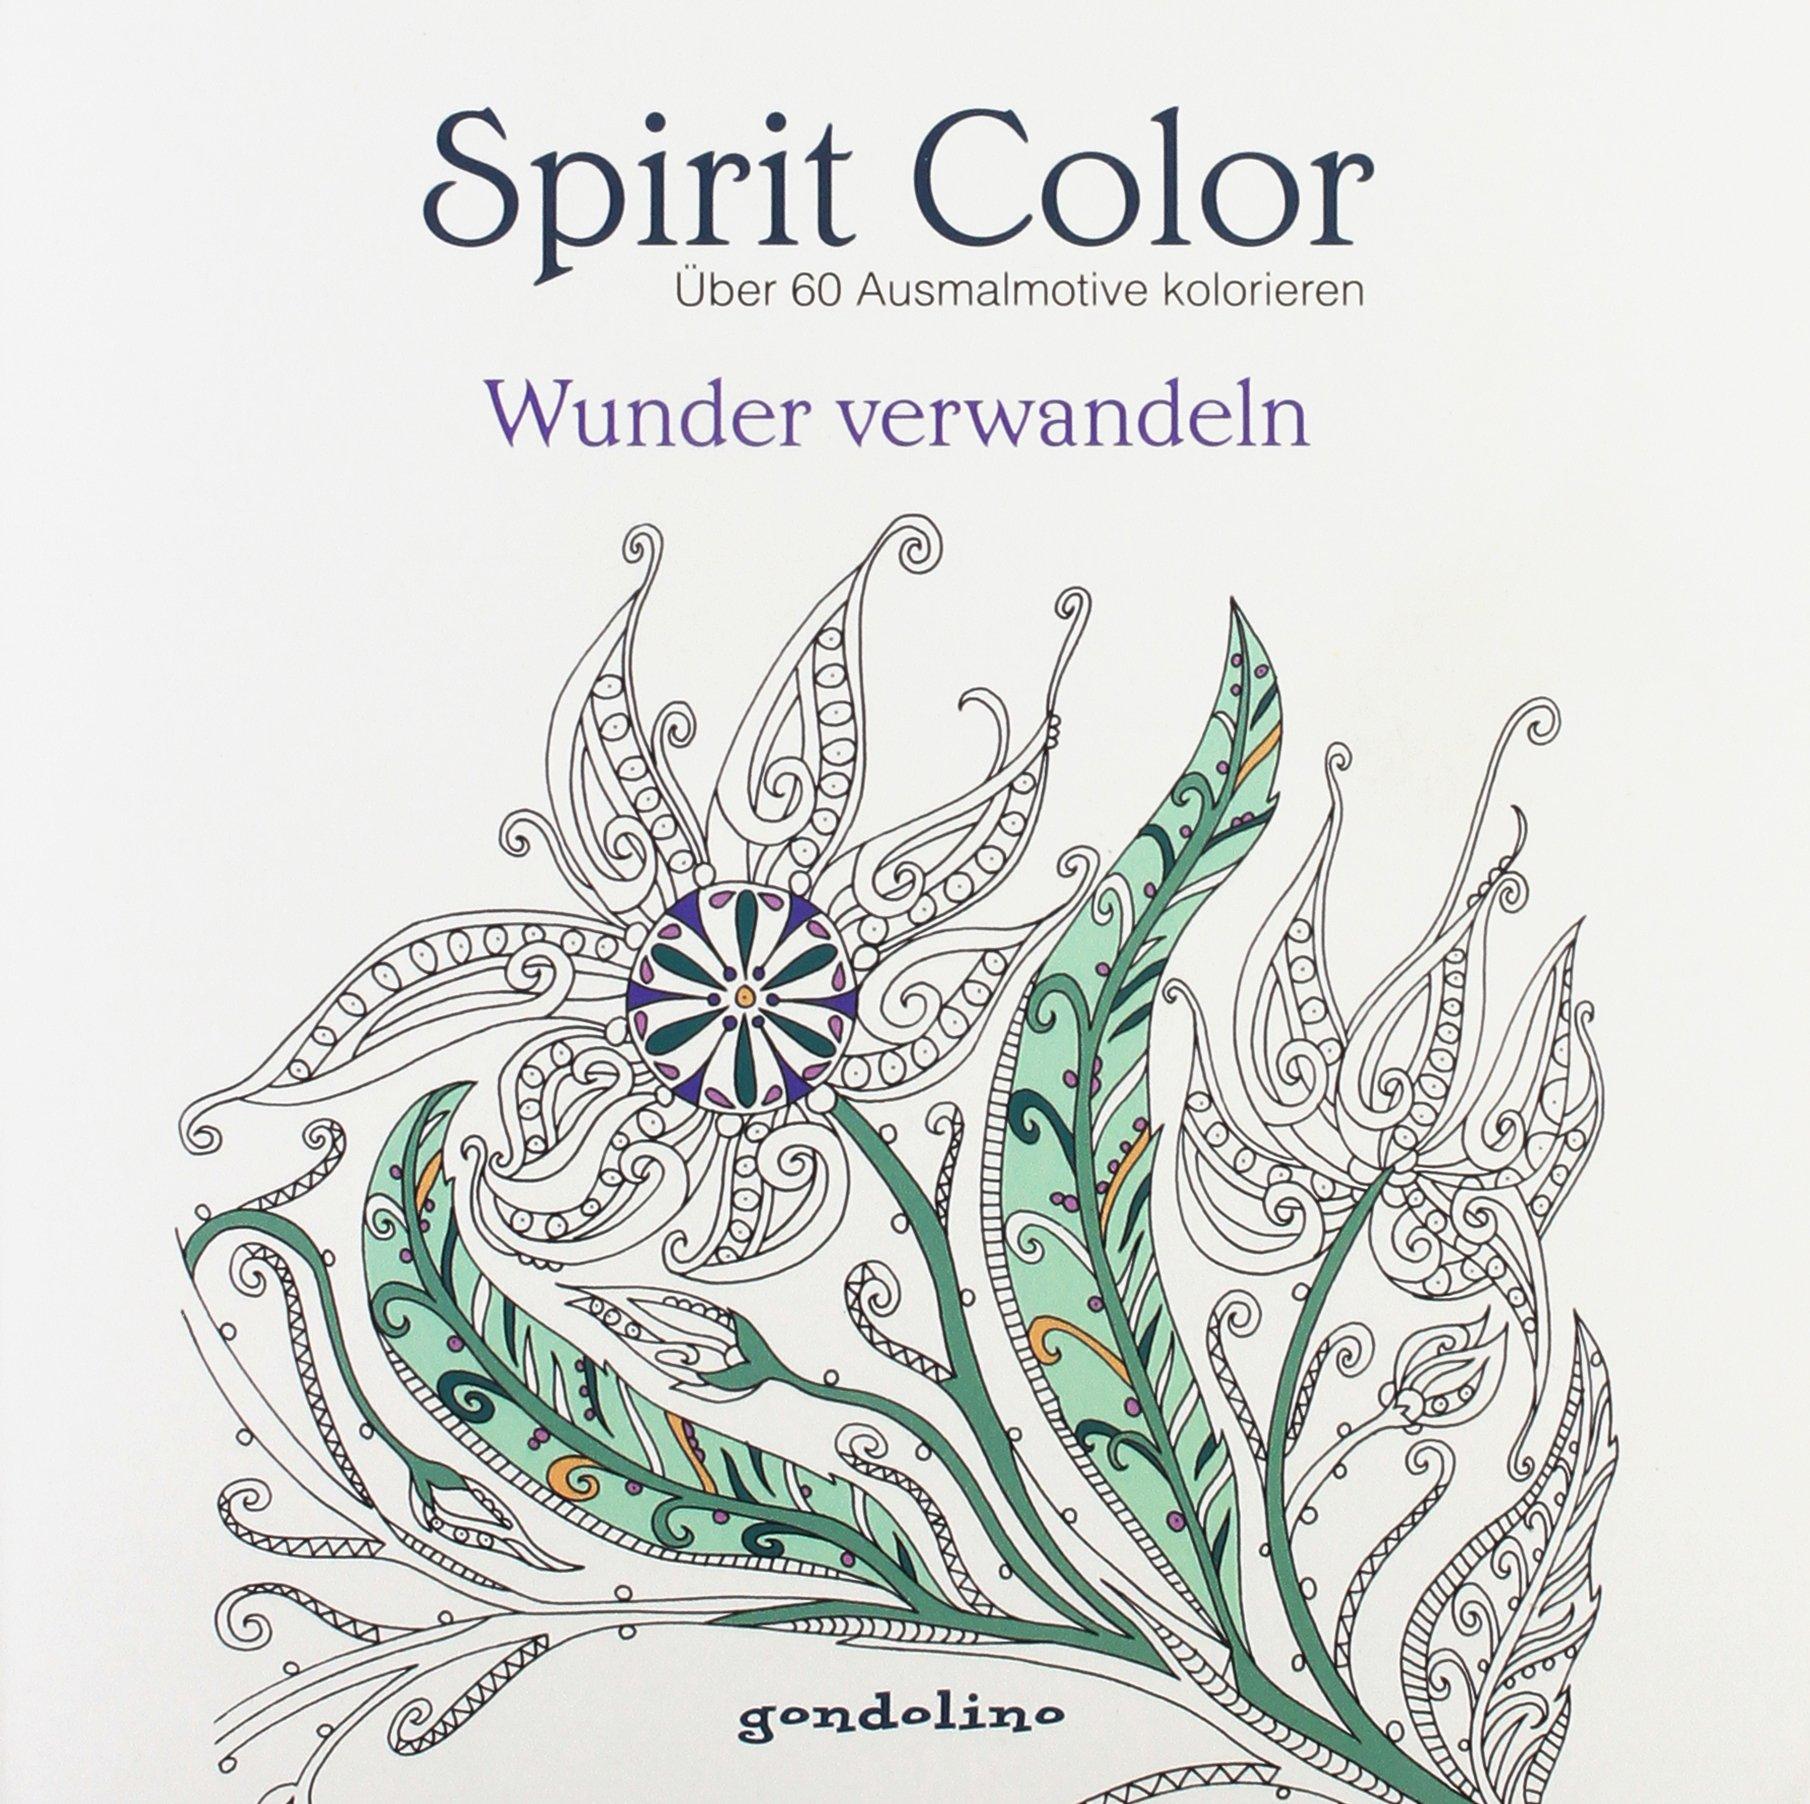 Spirit Color Wunder verwandeln